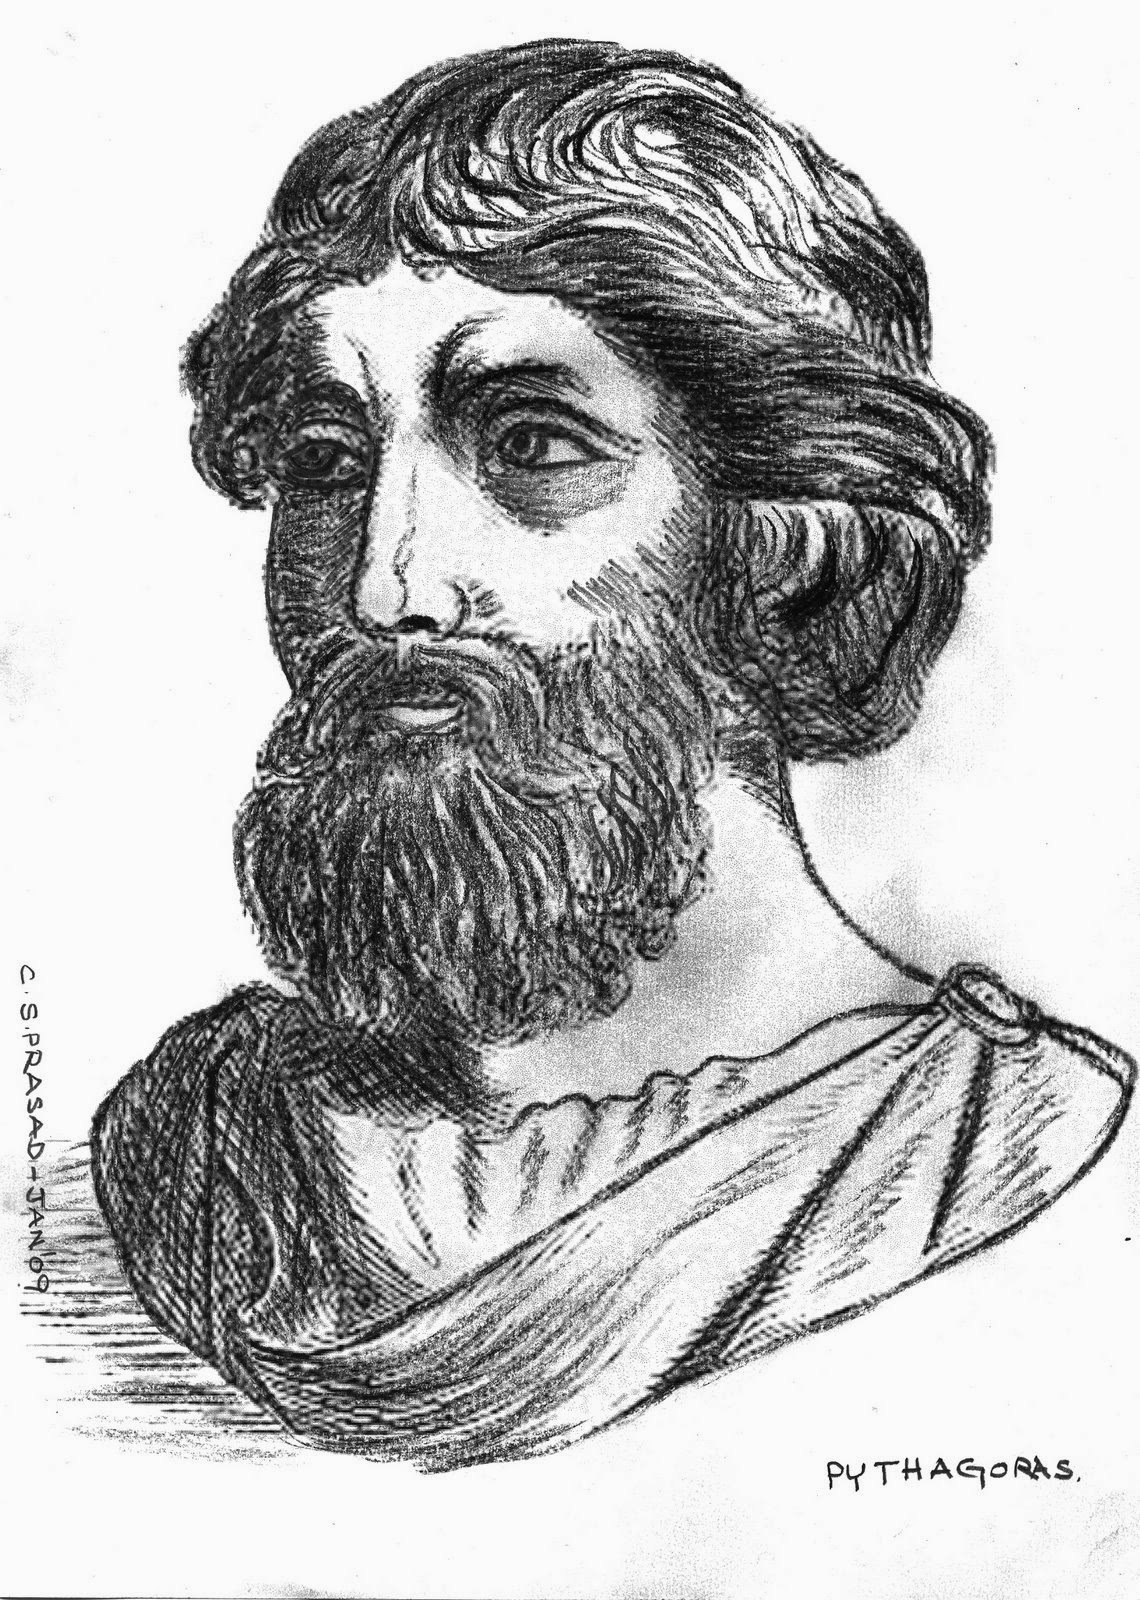 Pythagoras (582-496 SM) Orang yang pertama kali mencetuskan aksioma